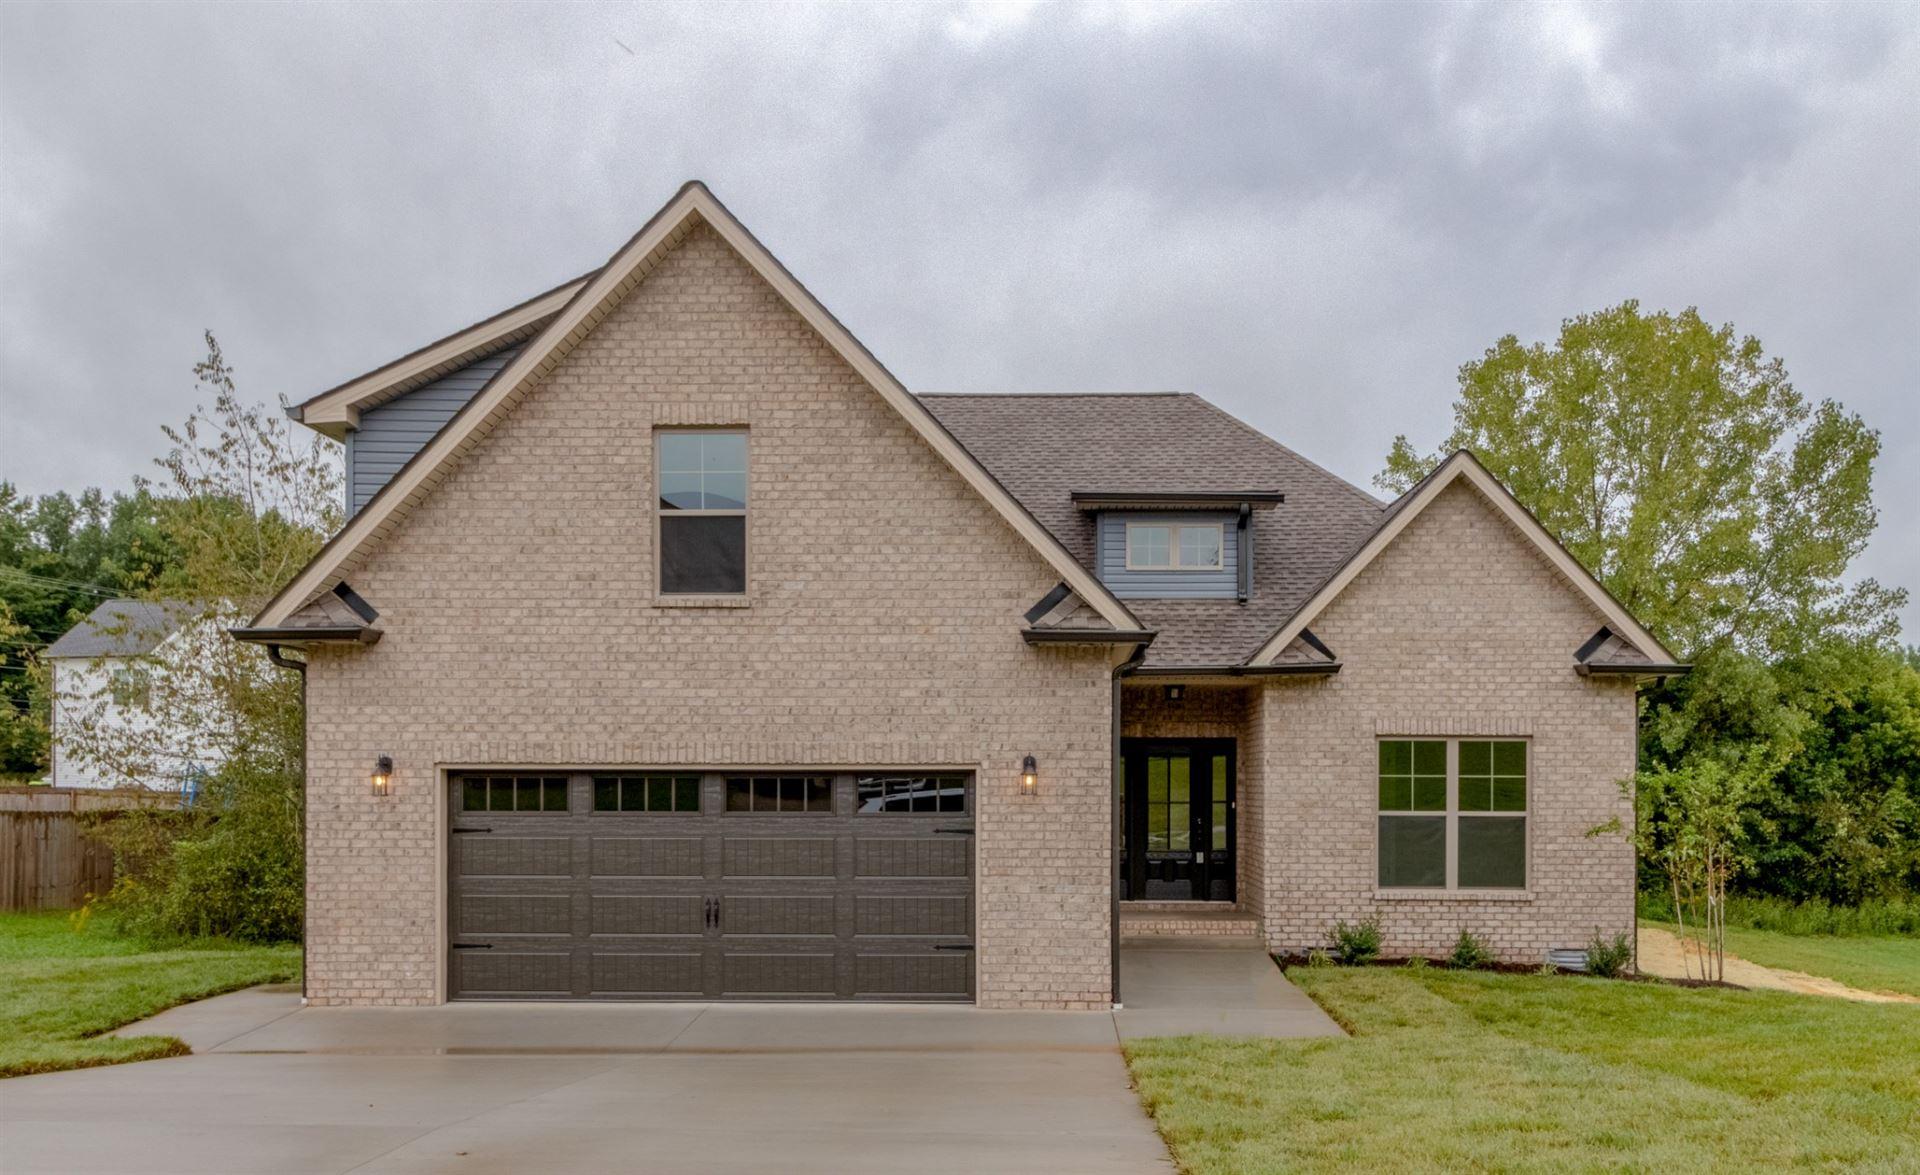 856 S Ridge Trl, Clarksville, TN 37043 - MLS#: 2261859